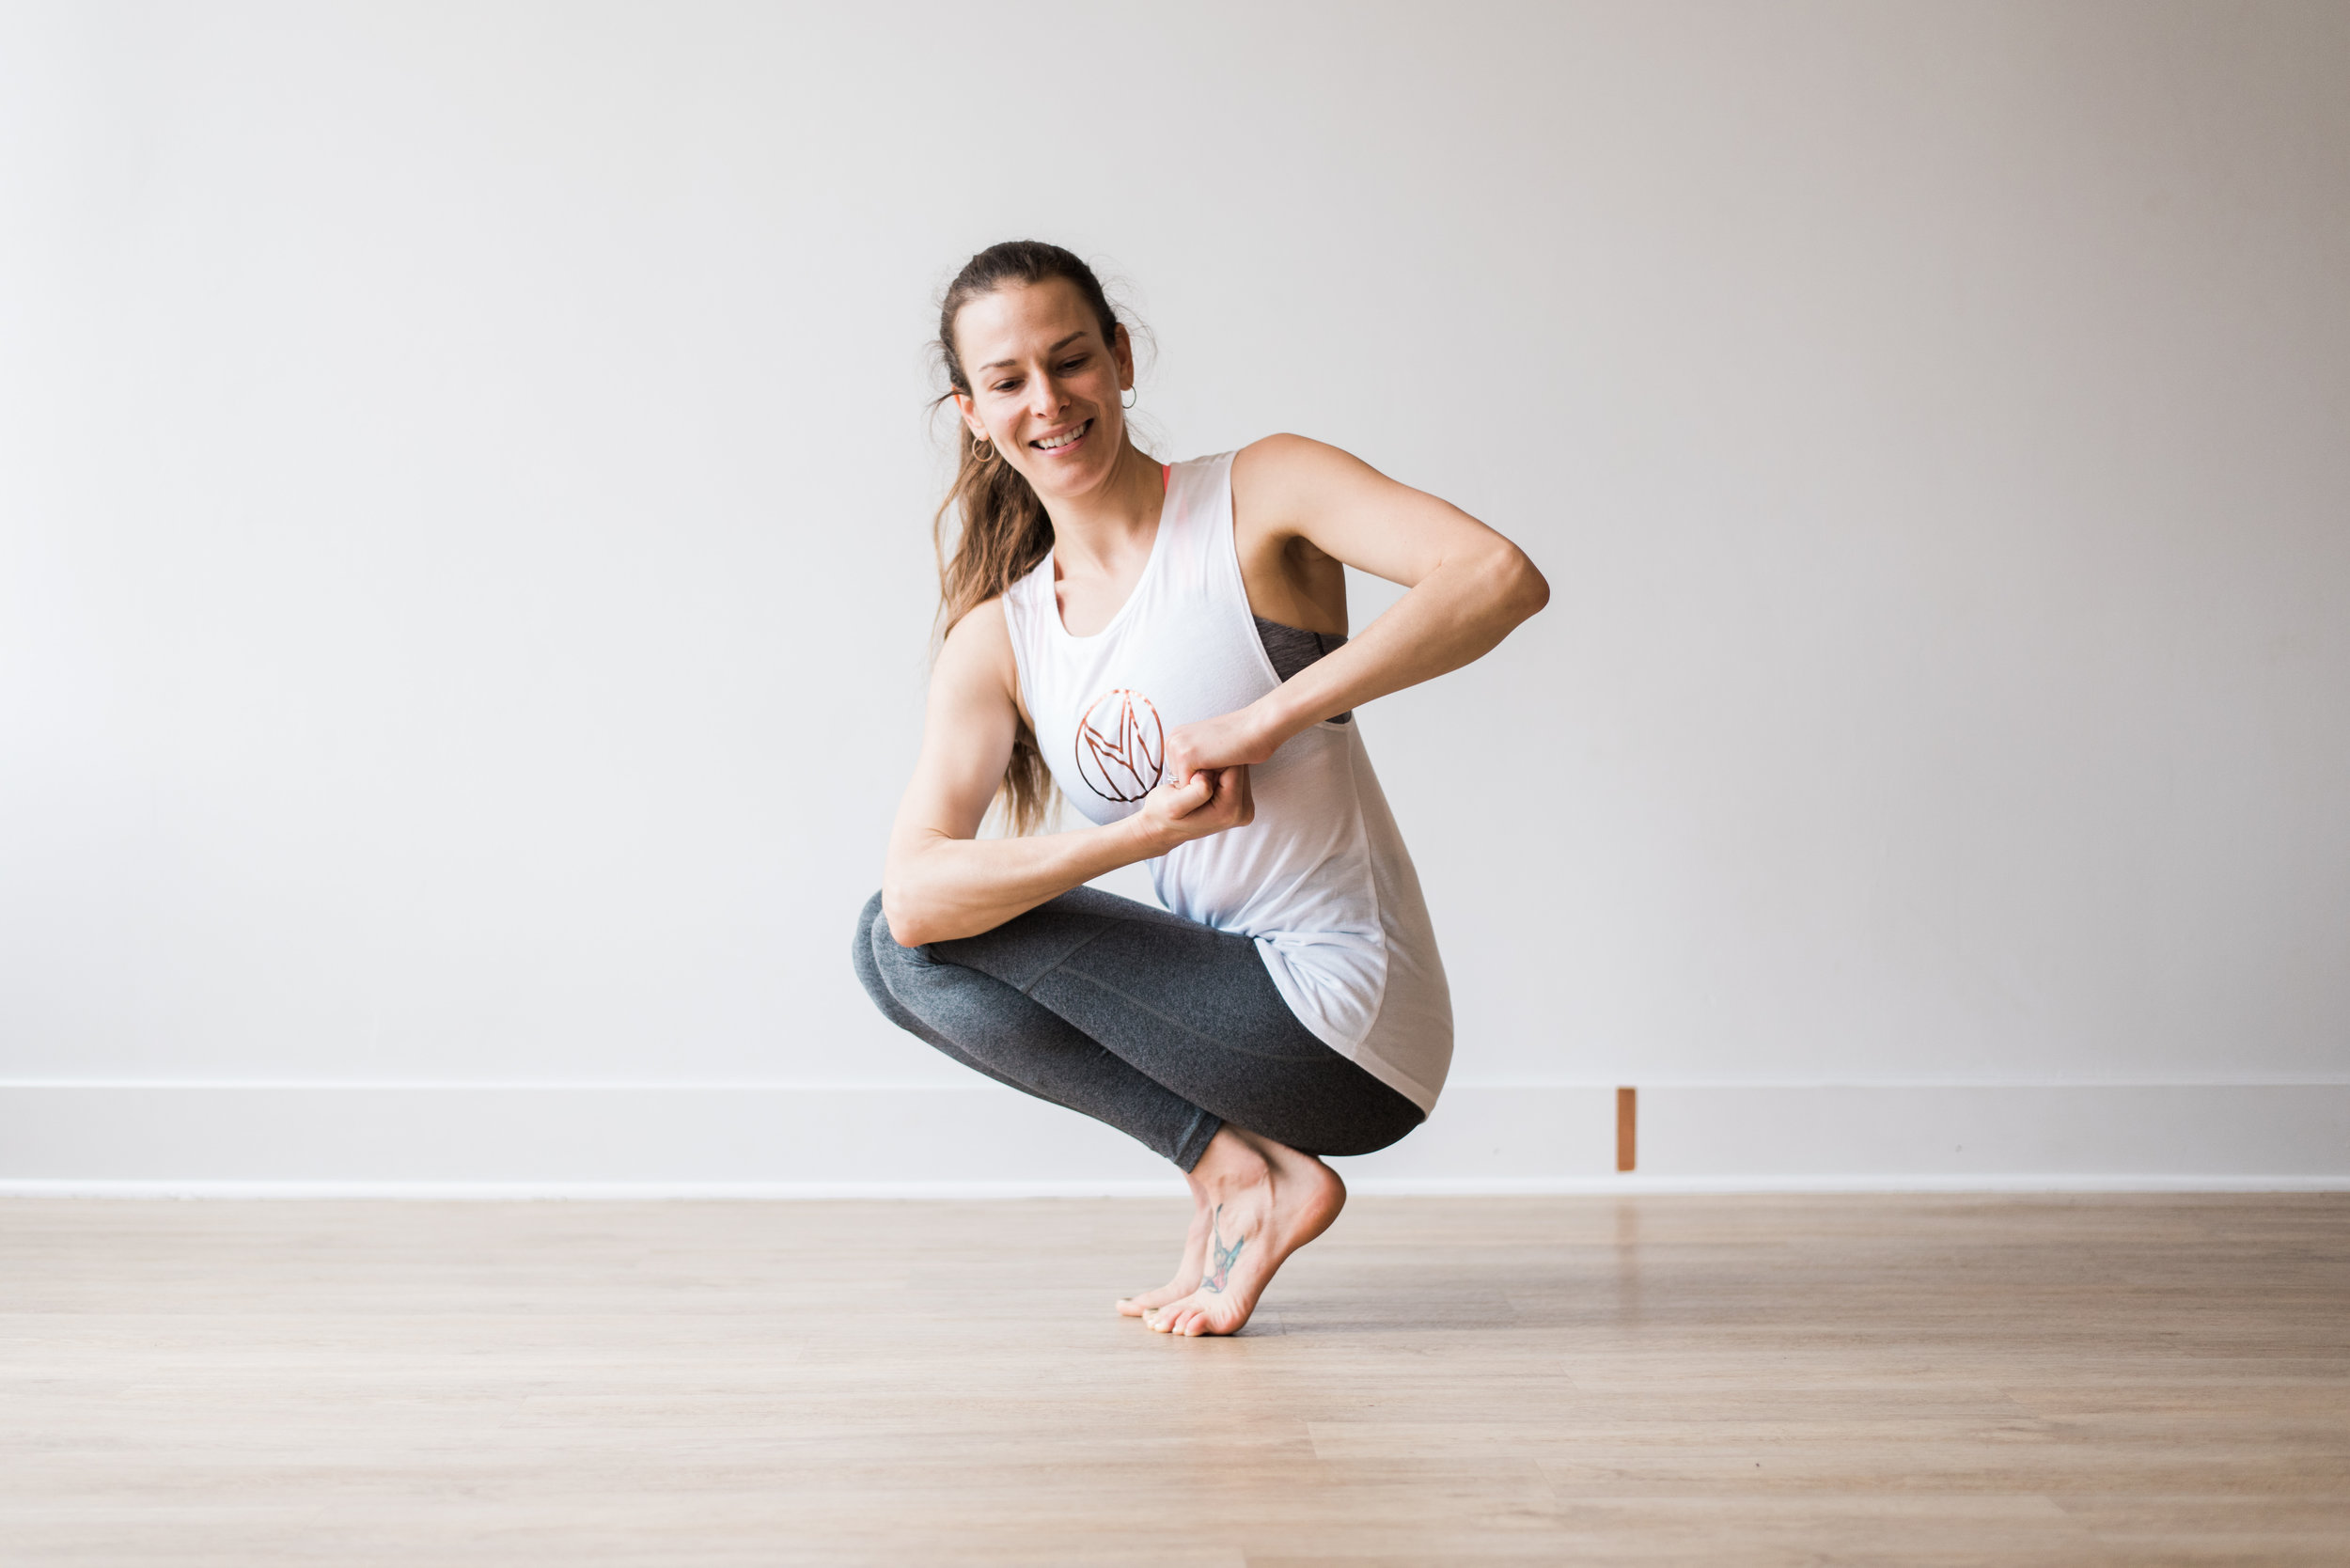 noose pose, aparigraha, yoga philosophy, yamas and niyamas, metta yoga, yoga marin, anna hughes yoga, victoria heron yoga, jessie cox yoga